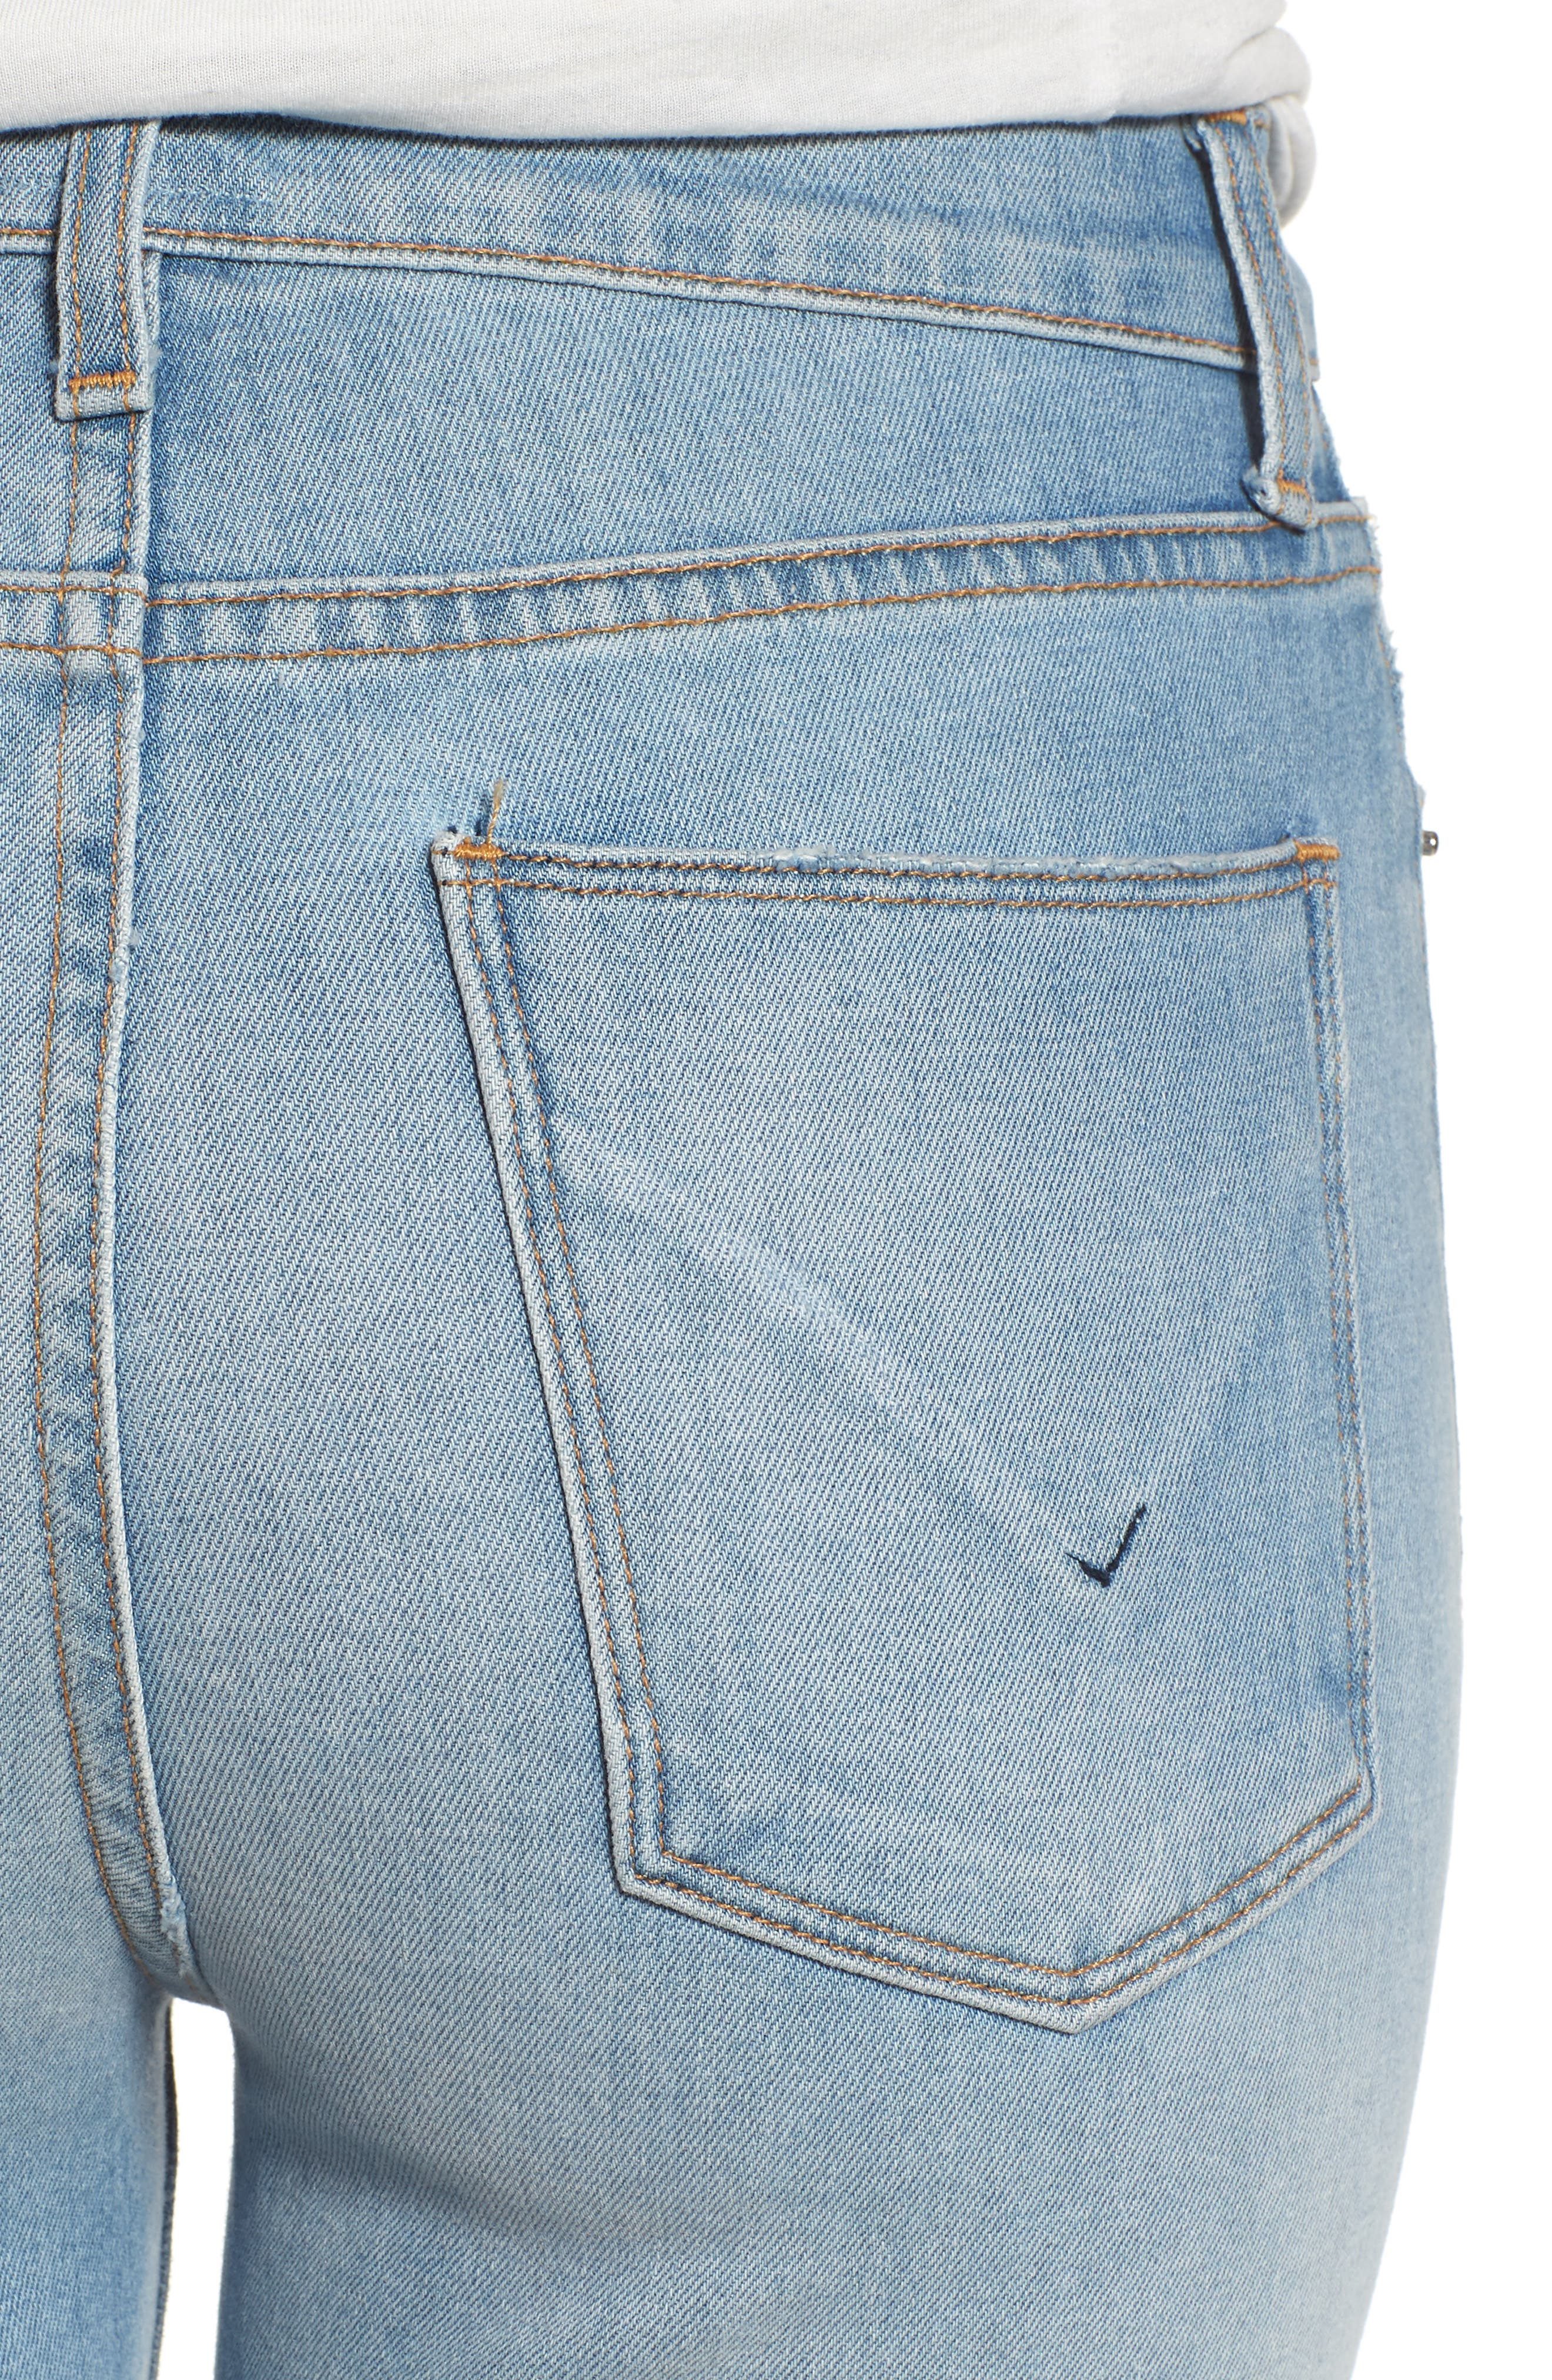 Zoeey High Waist Cutoff Boyfriend Shorts,                             Alternate thumbnail 4, color,                             420